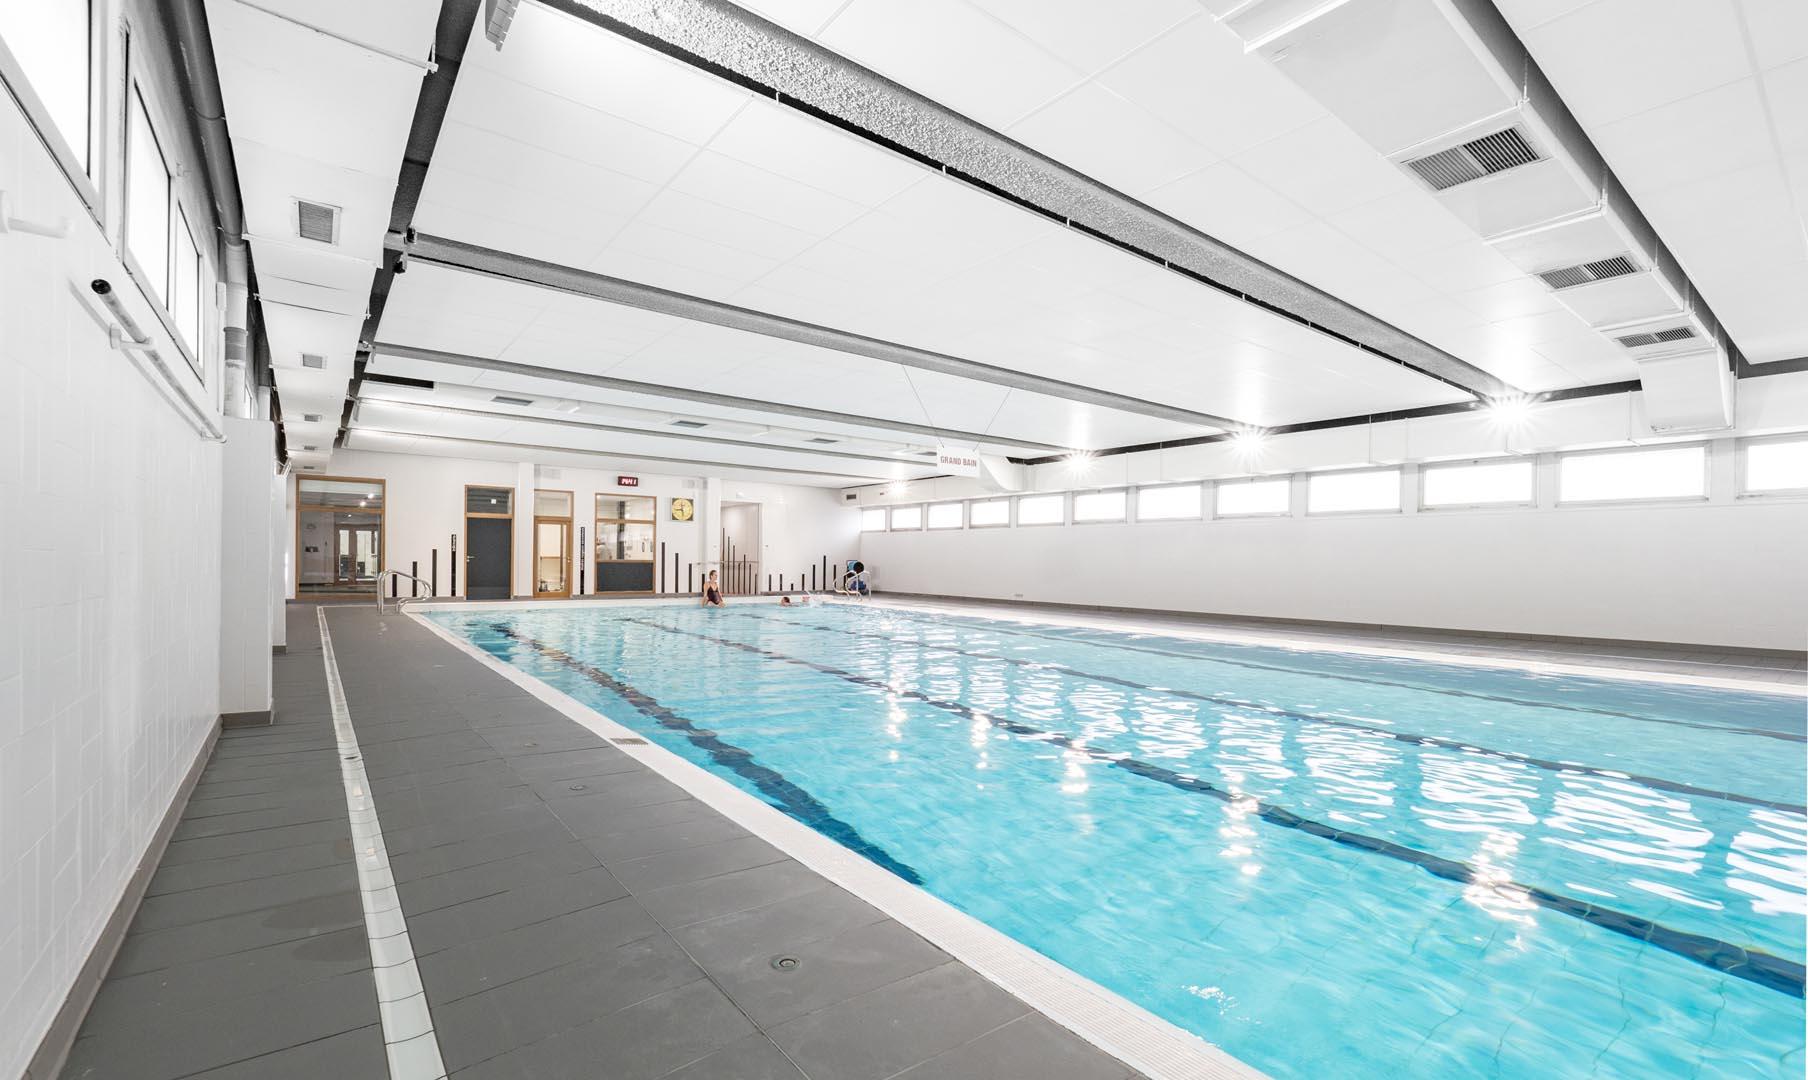 piscine-darnetal-cba-rouen